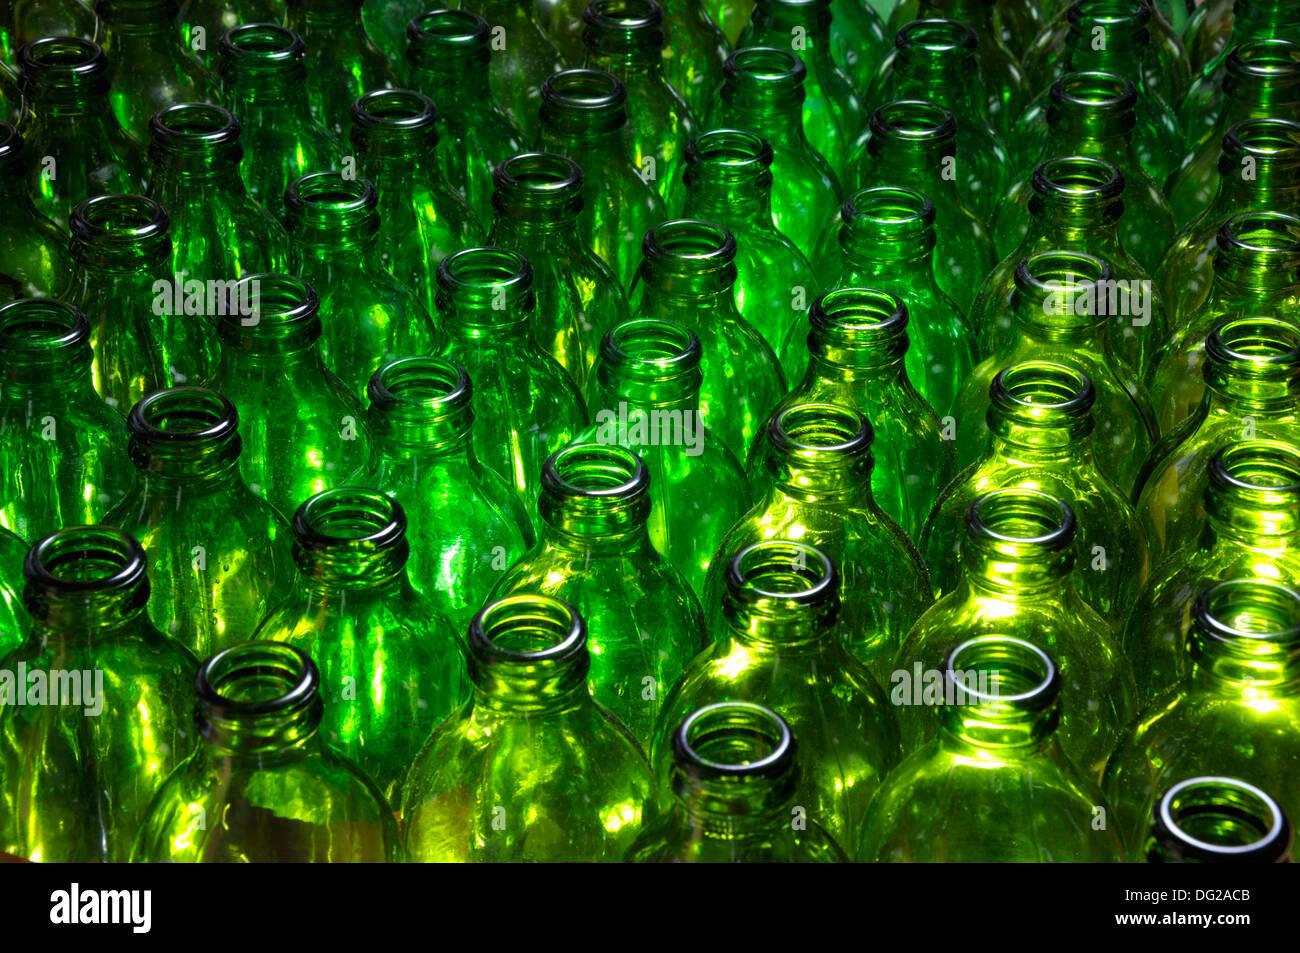 Leere grüne Bierflaschen Stockbild